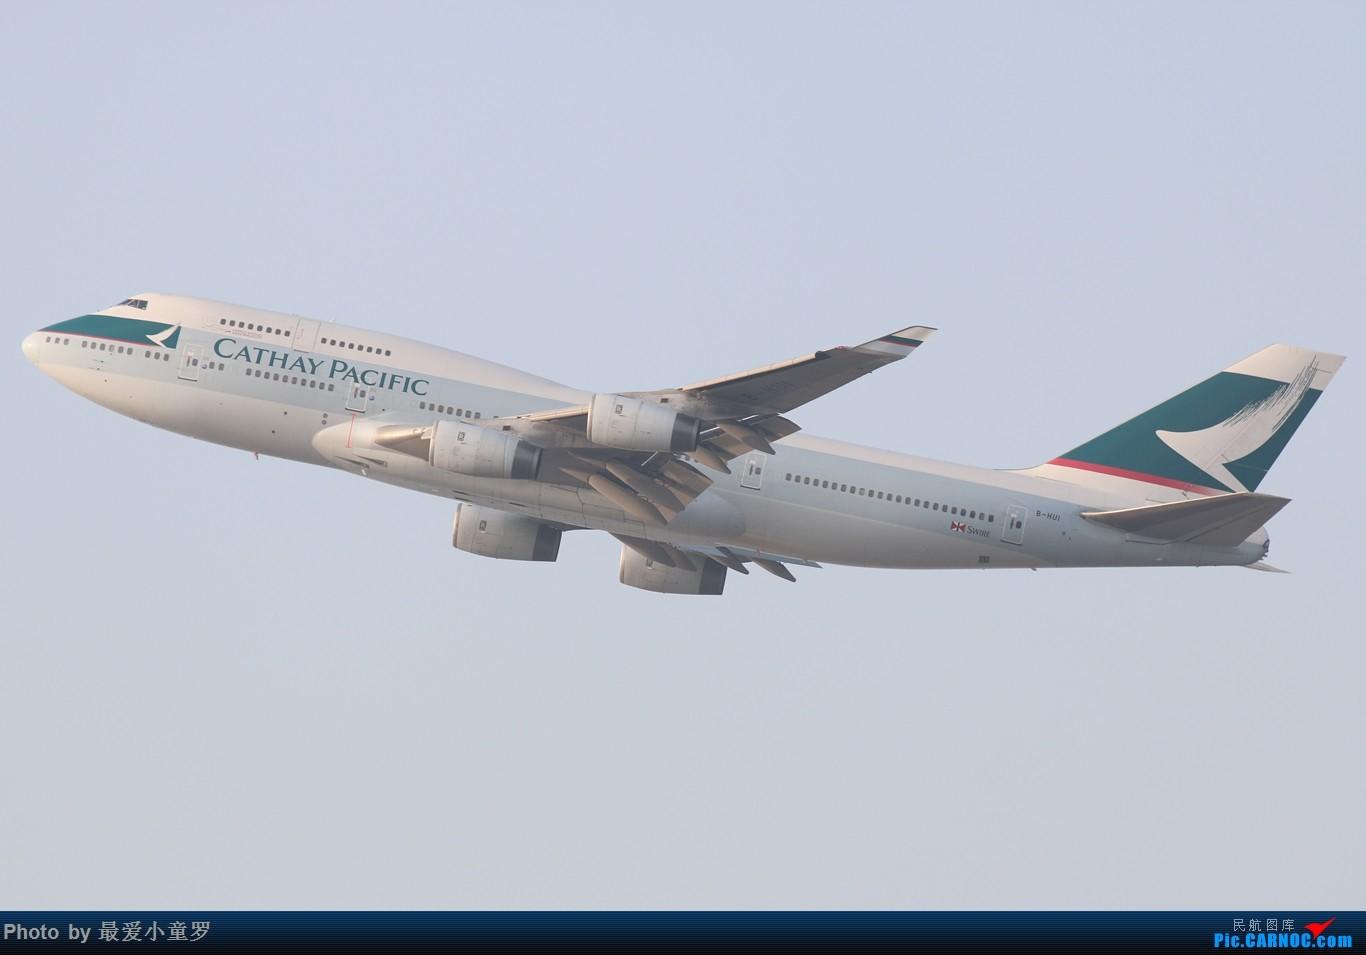 Re:[原创]羊年第一帖——1月25日香港沙螺湾拍机篇之波音747 BOEING 747-400 B-HUI 中国香港赤鱲角国际机场